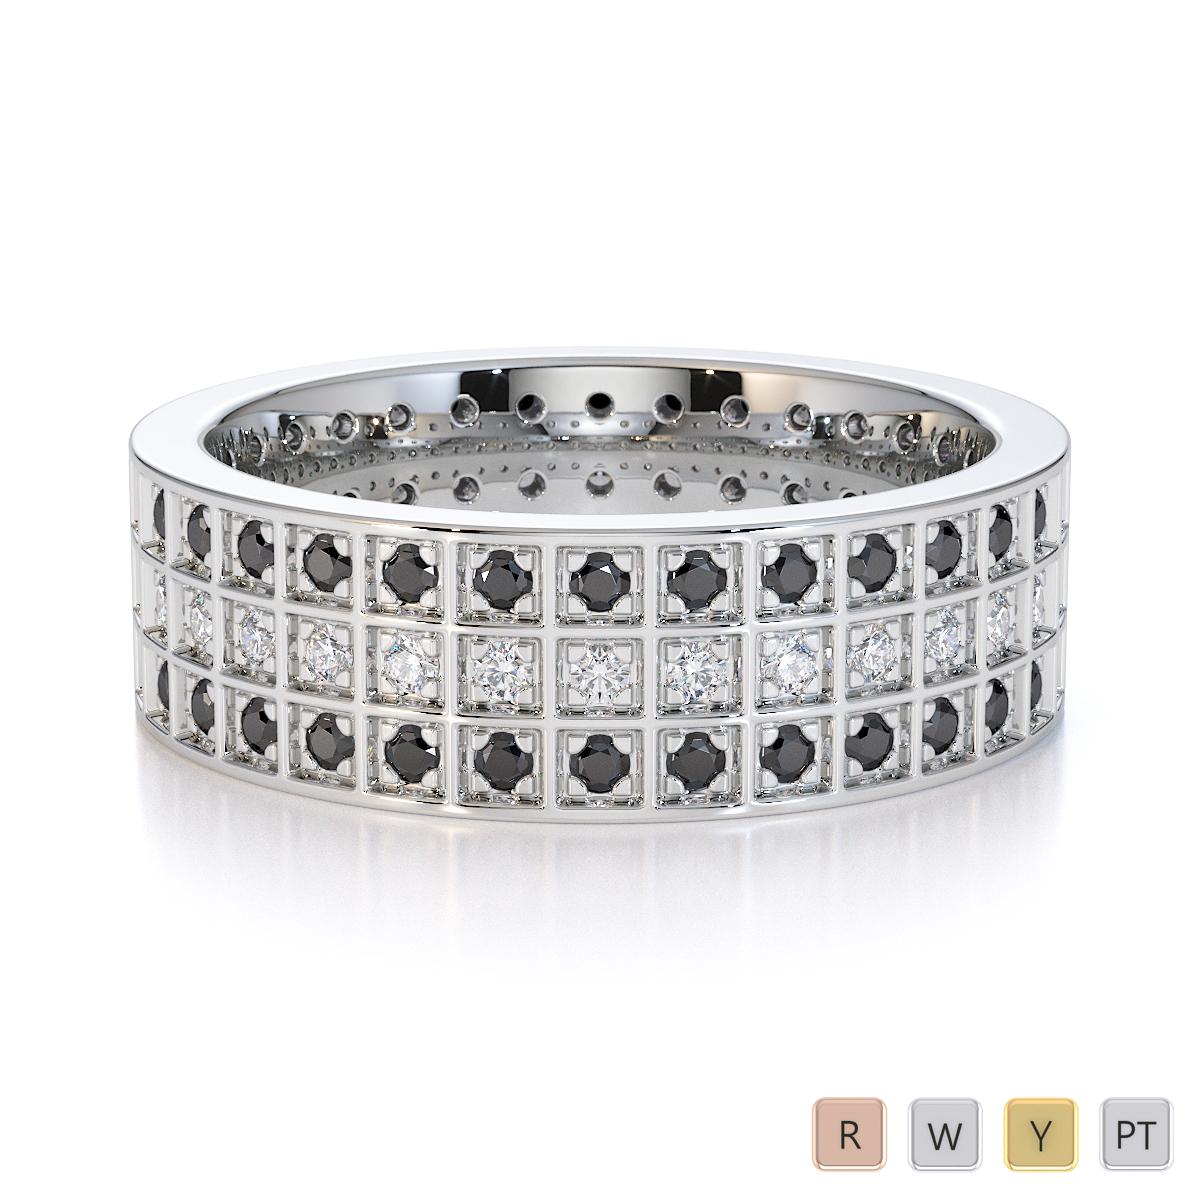 Gold / Platinum Black Diamond with Diamond Full Eternity Ring RZ1512